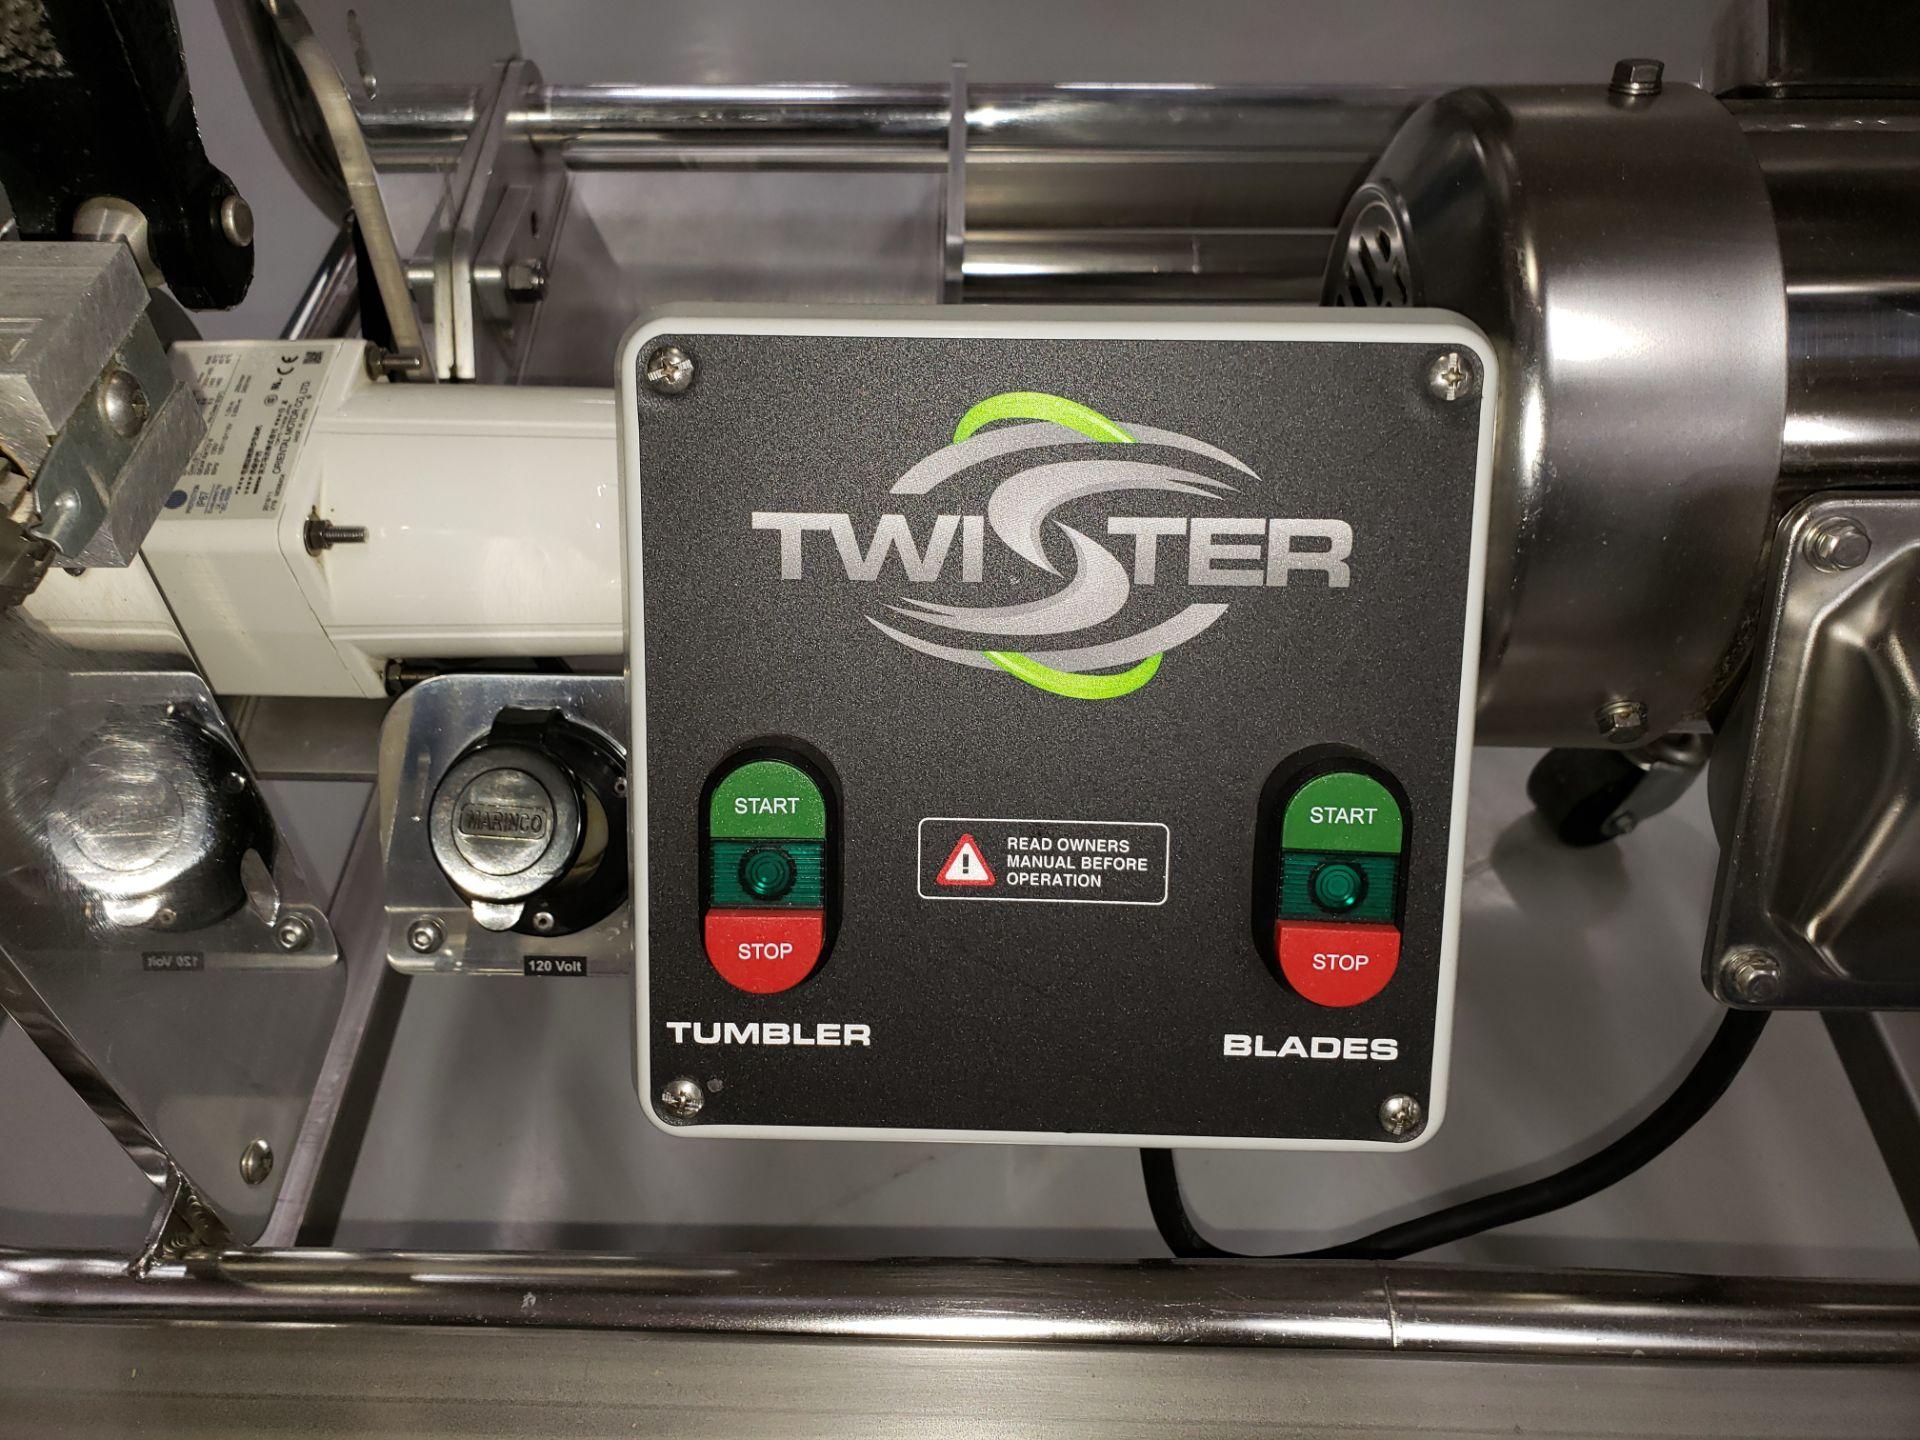 Kierton Inc Twister T2 - Bud Trimmer - Image 2 of 13